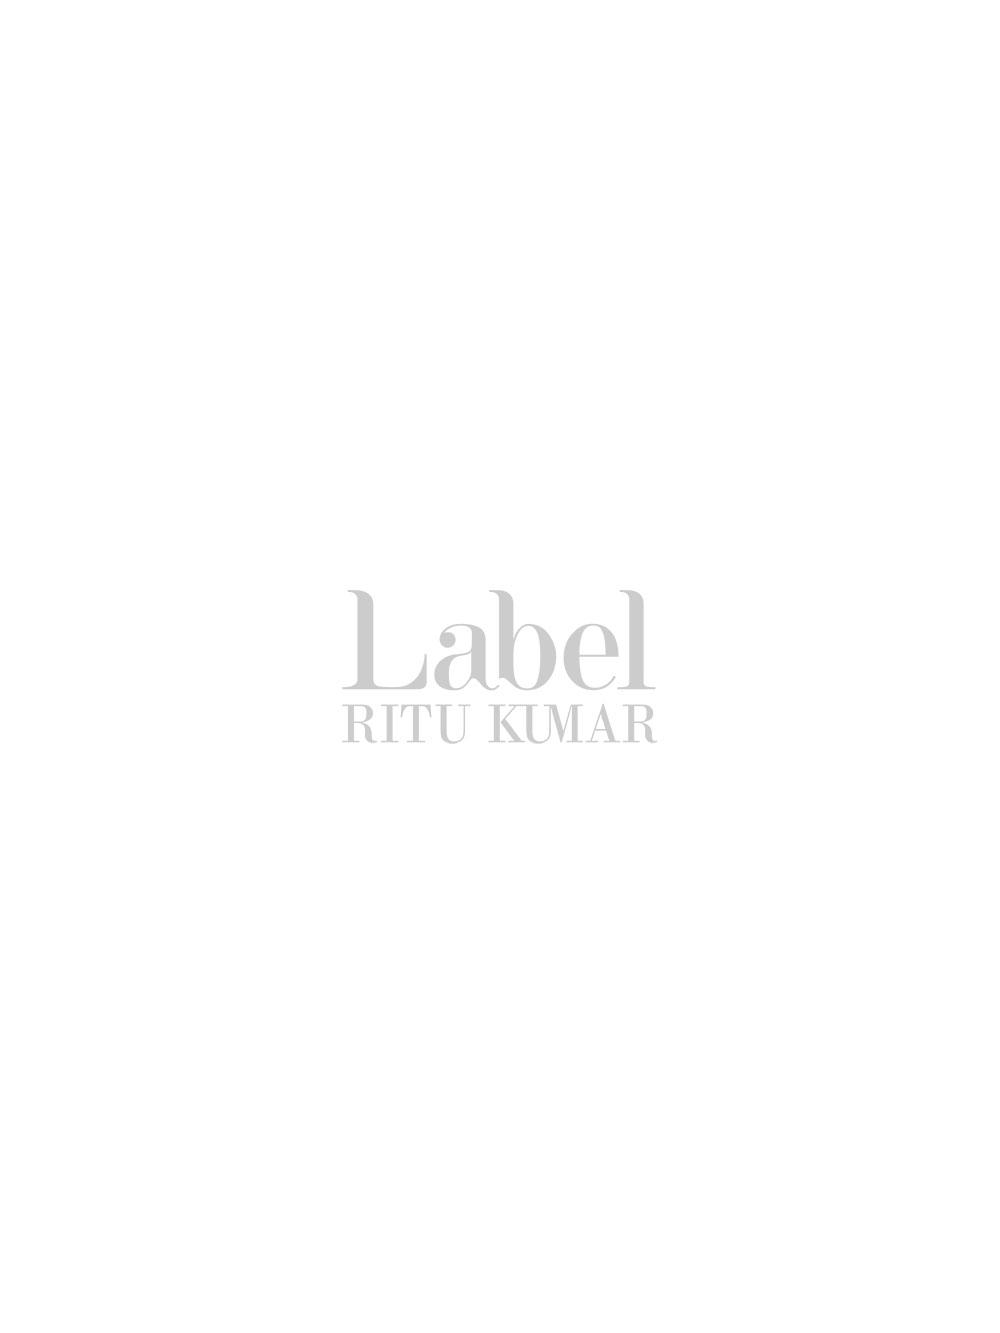 Long Sheer Shrug by label ritu kumar